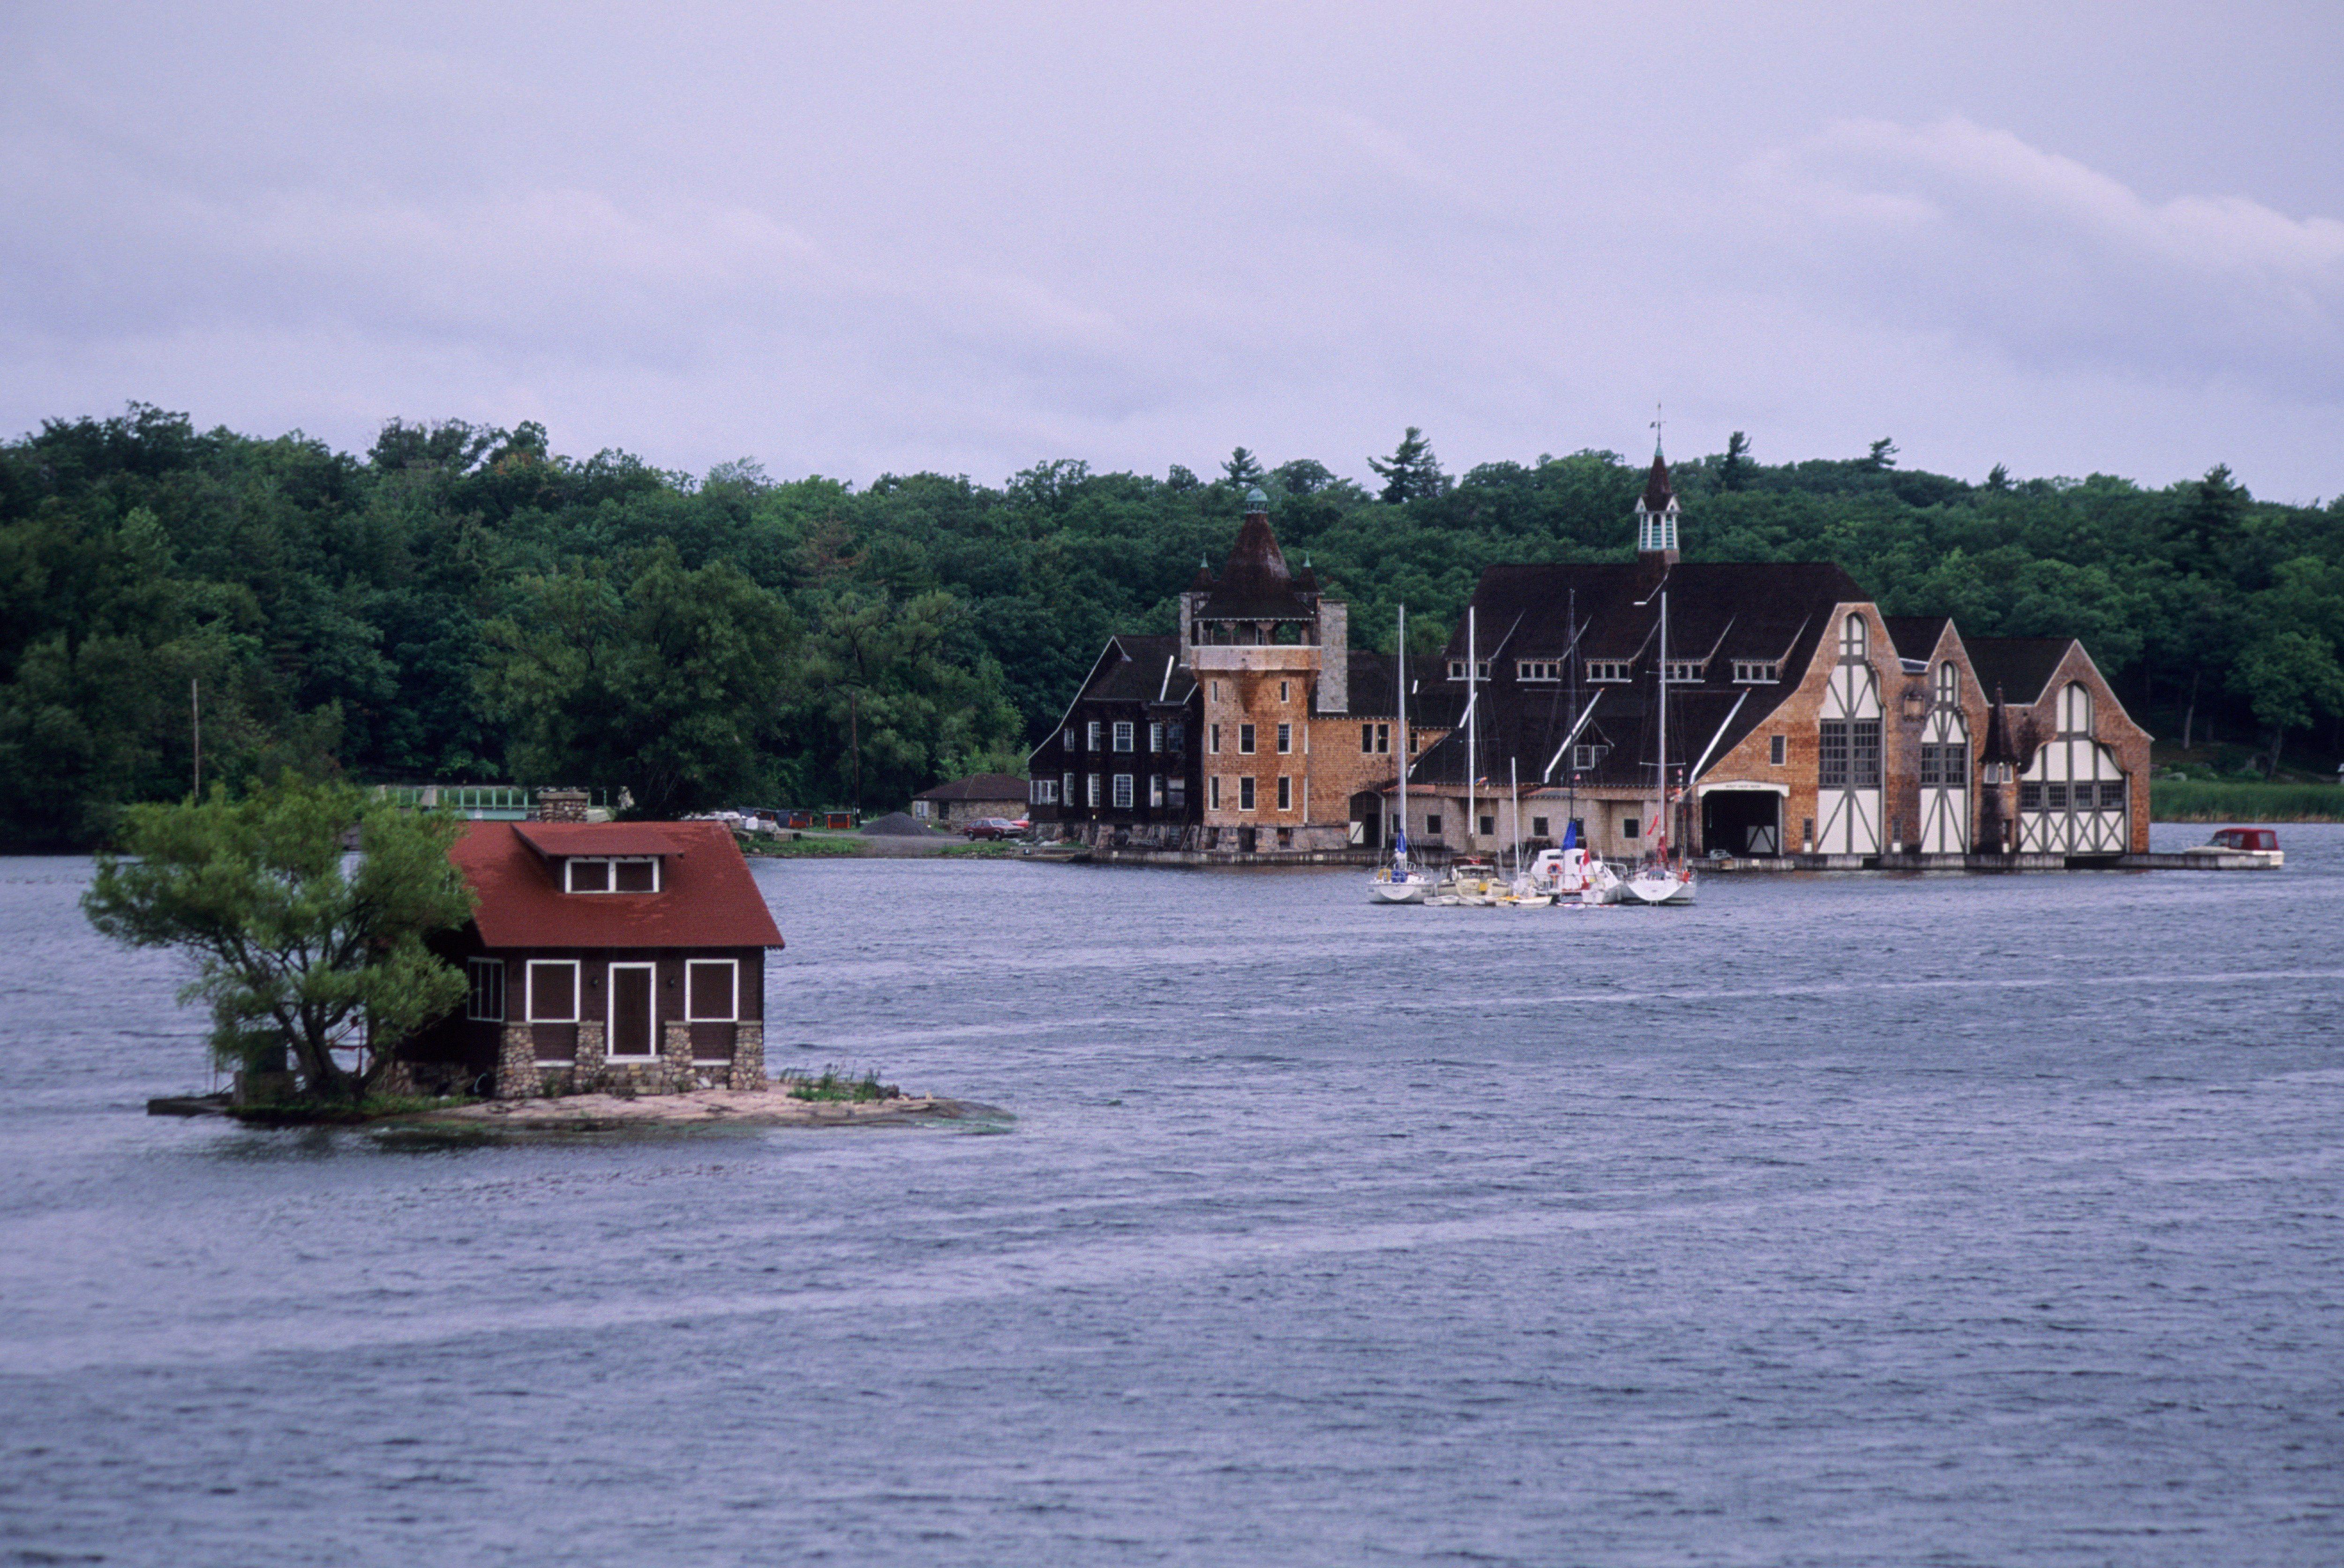 USA, New York, St. Lawrence Seaway, Thousand Islands...